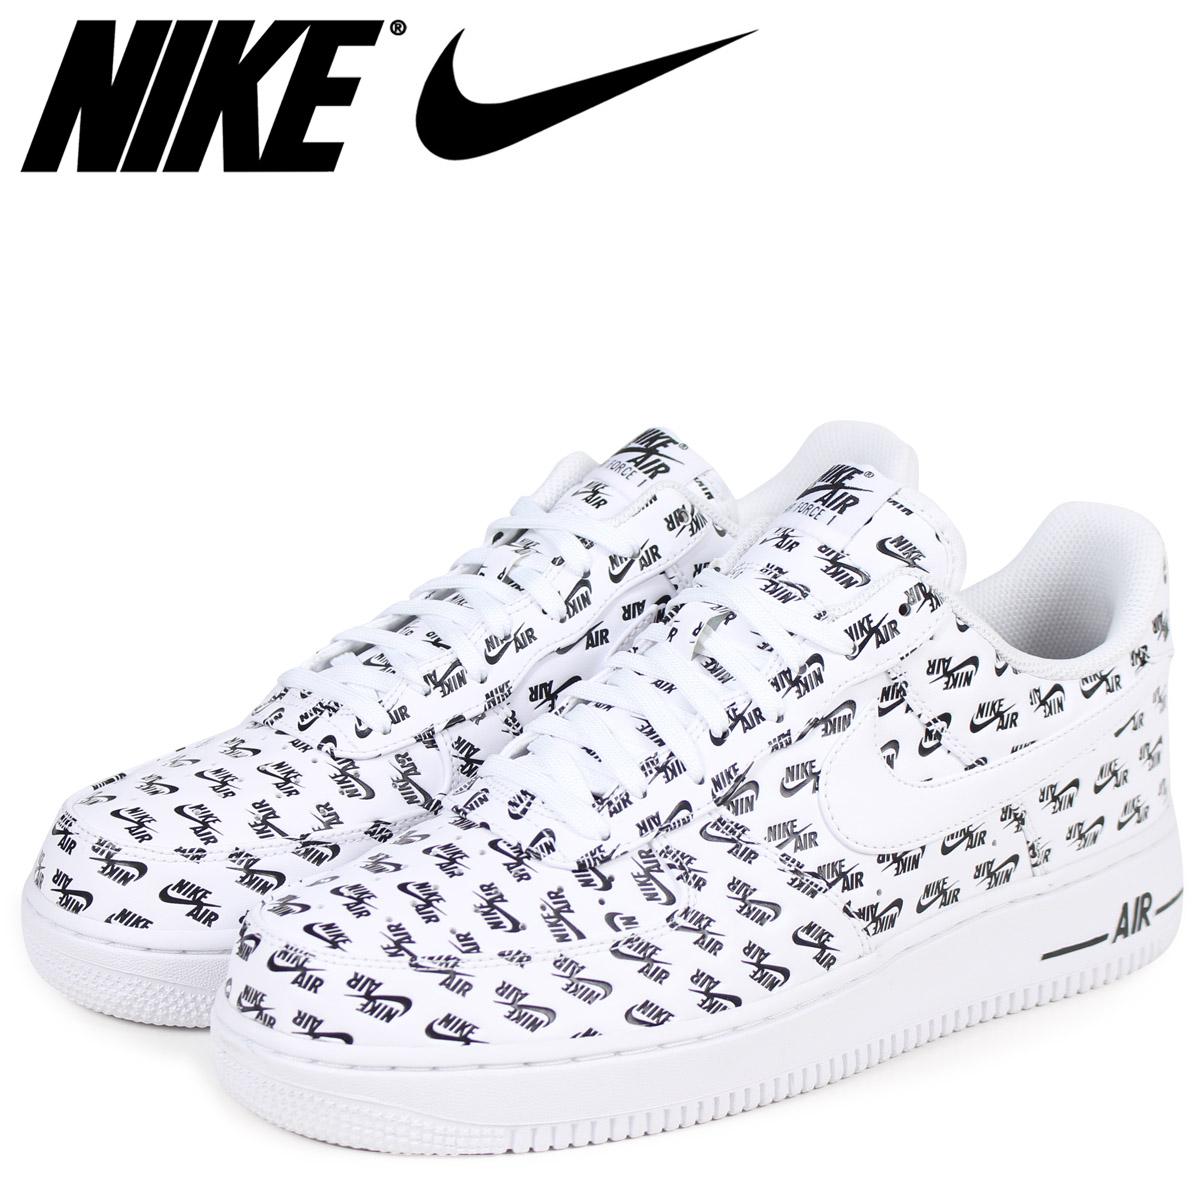 NIKE Nike air force 1 07 sneakers men AIR FORCE 1 QS ALL OVER LOGO AH8462 100 white white